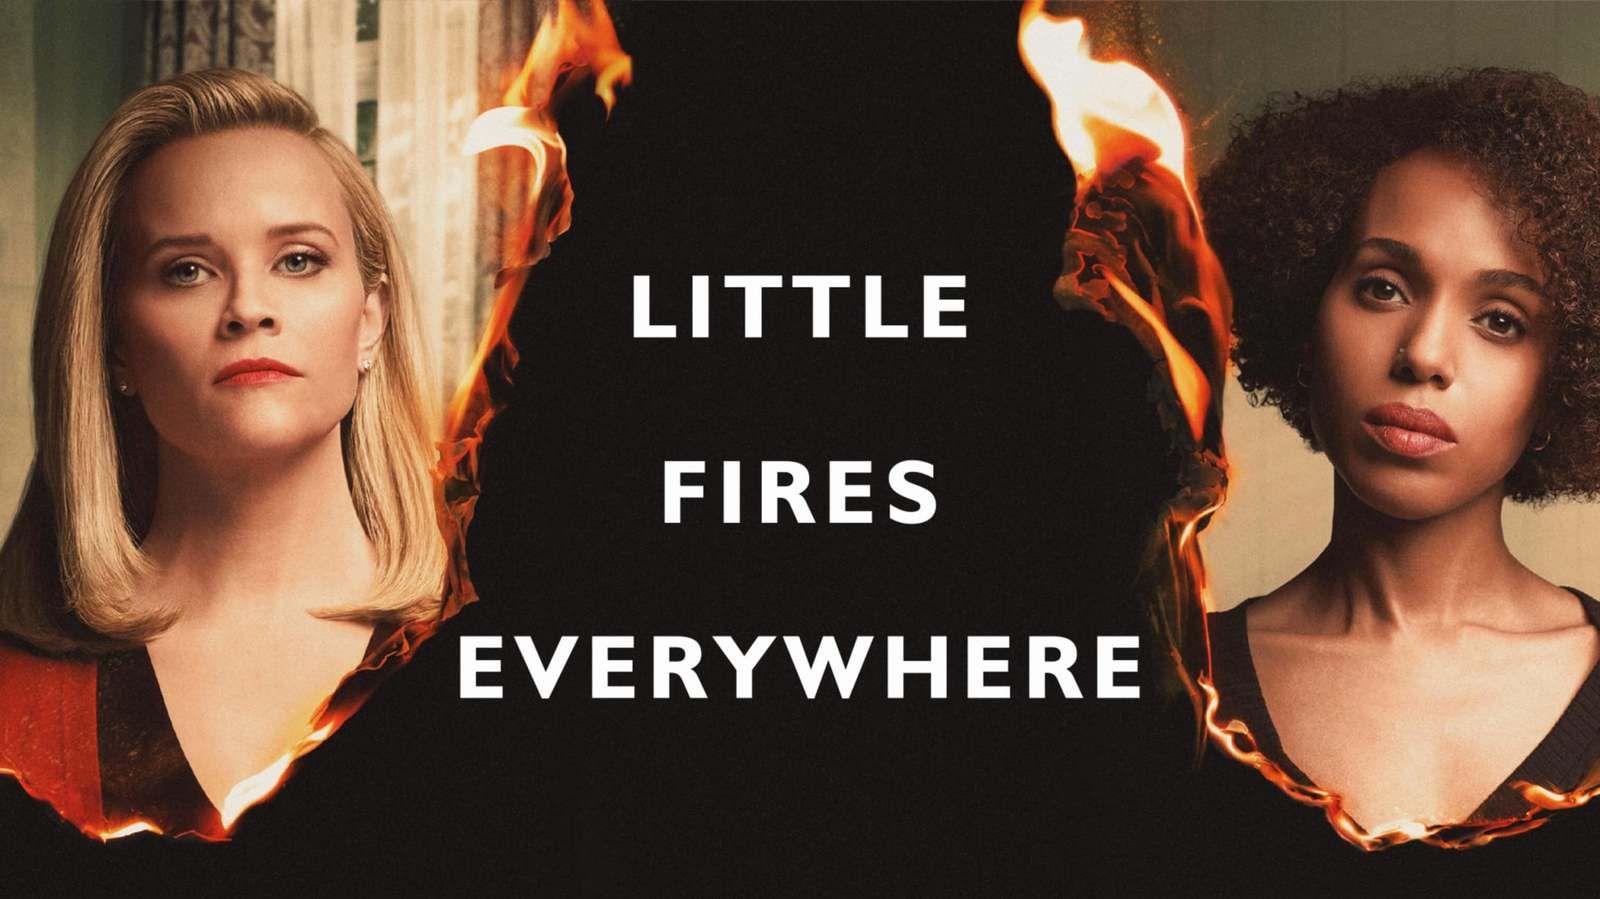 Little fires serie recomendada